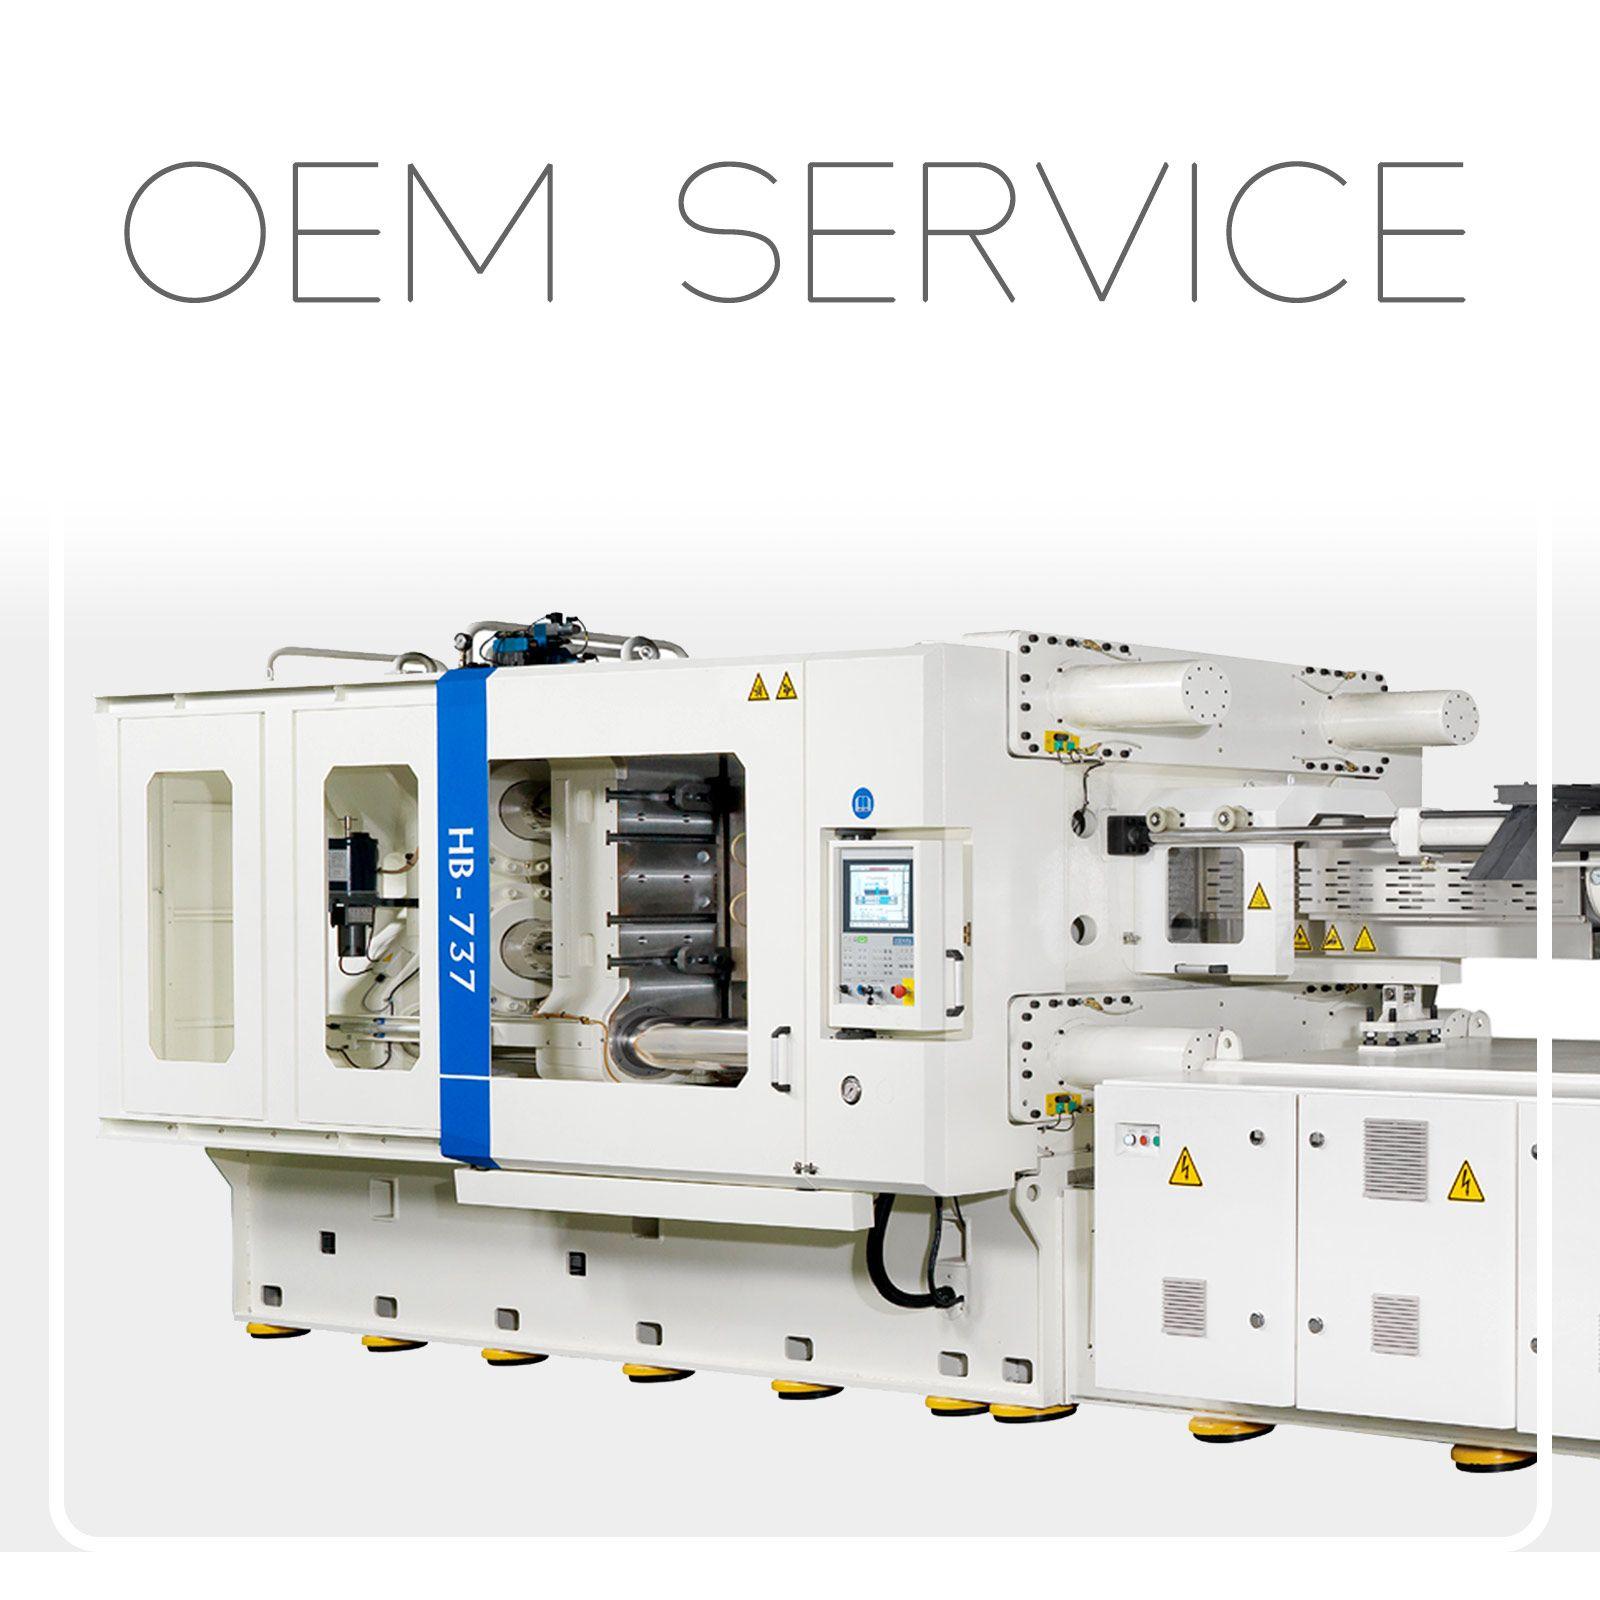 OEM Service - Tair Chu OEM SERVICE